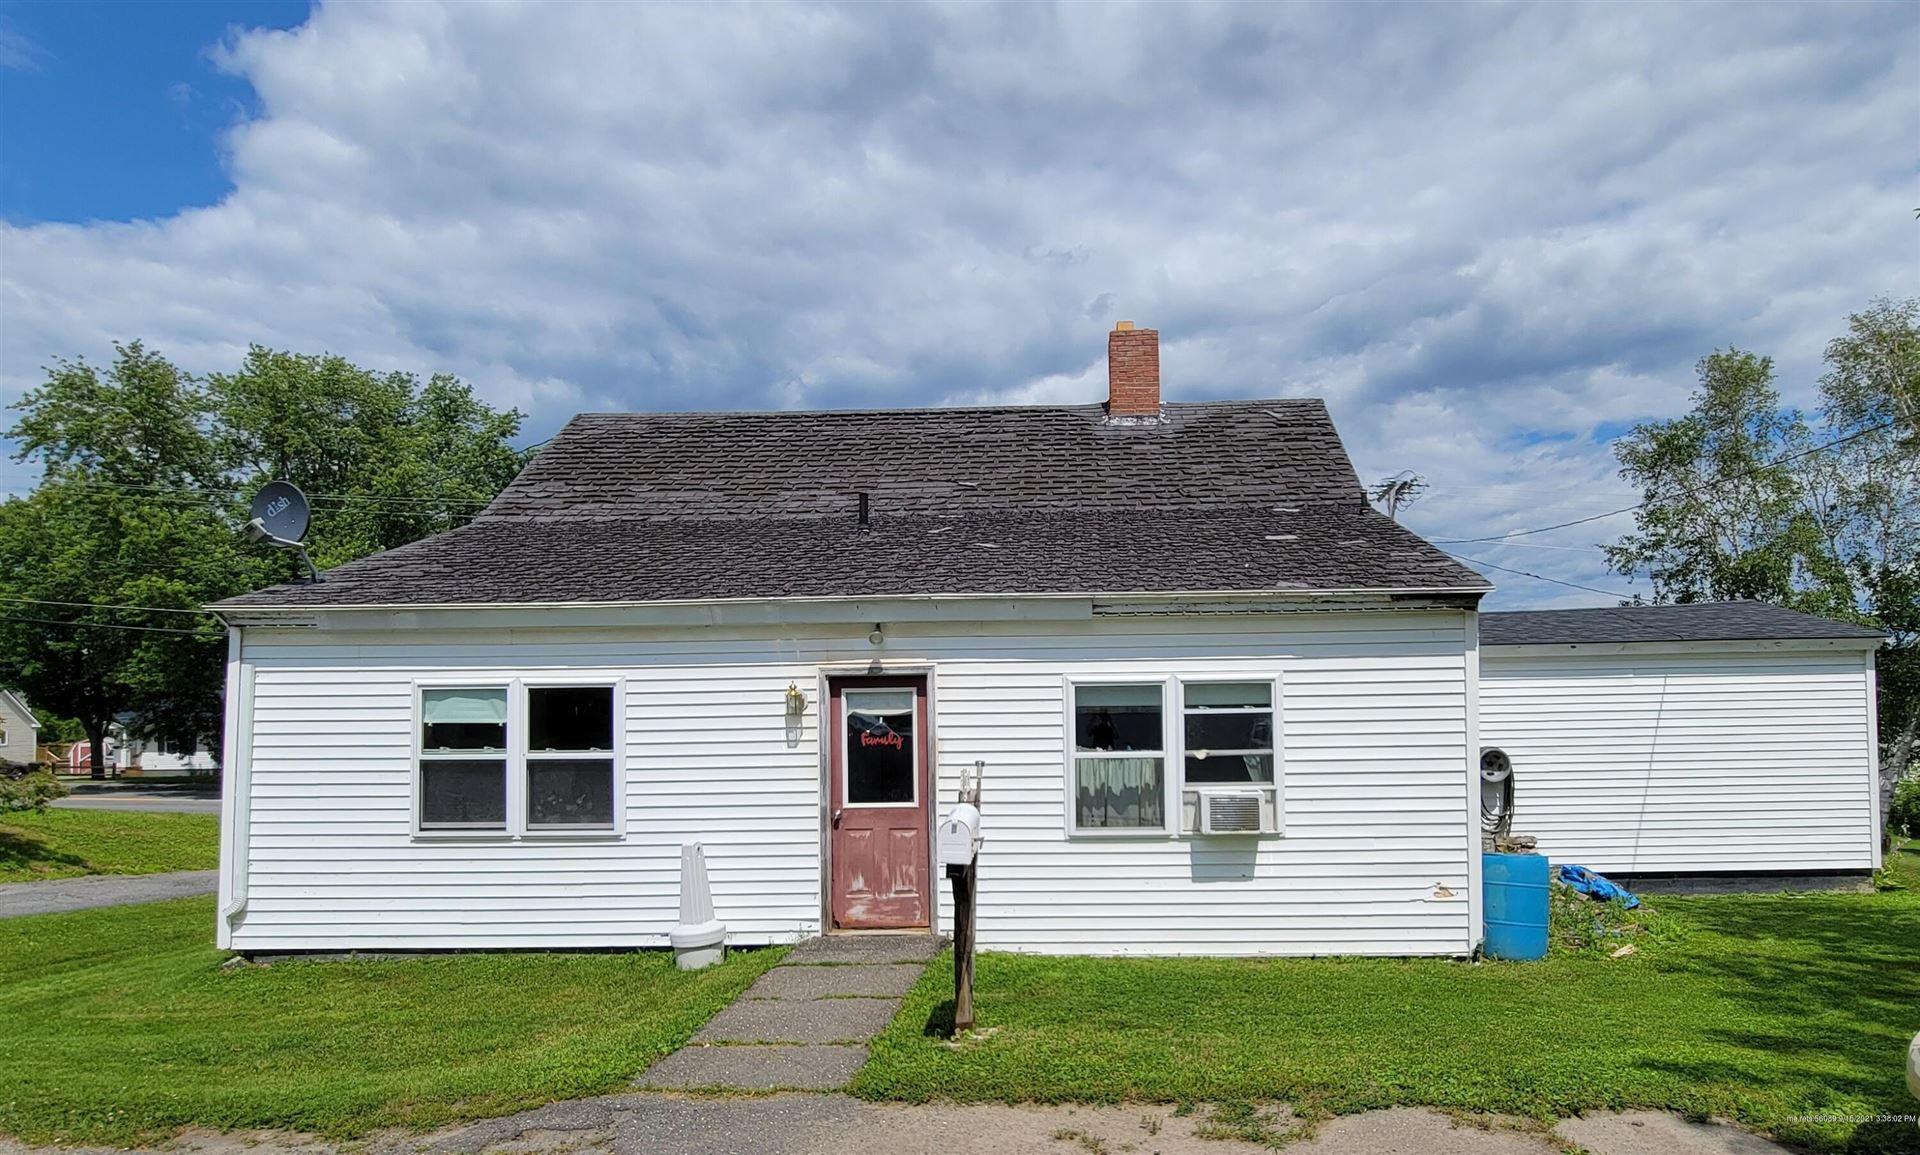 Photo of 115 Main Street, Fort Fairfield, ME 04742 (MLS # 1508960)